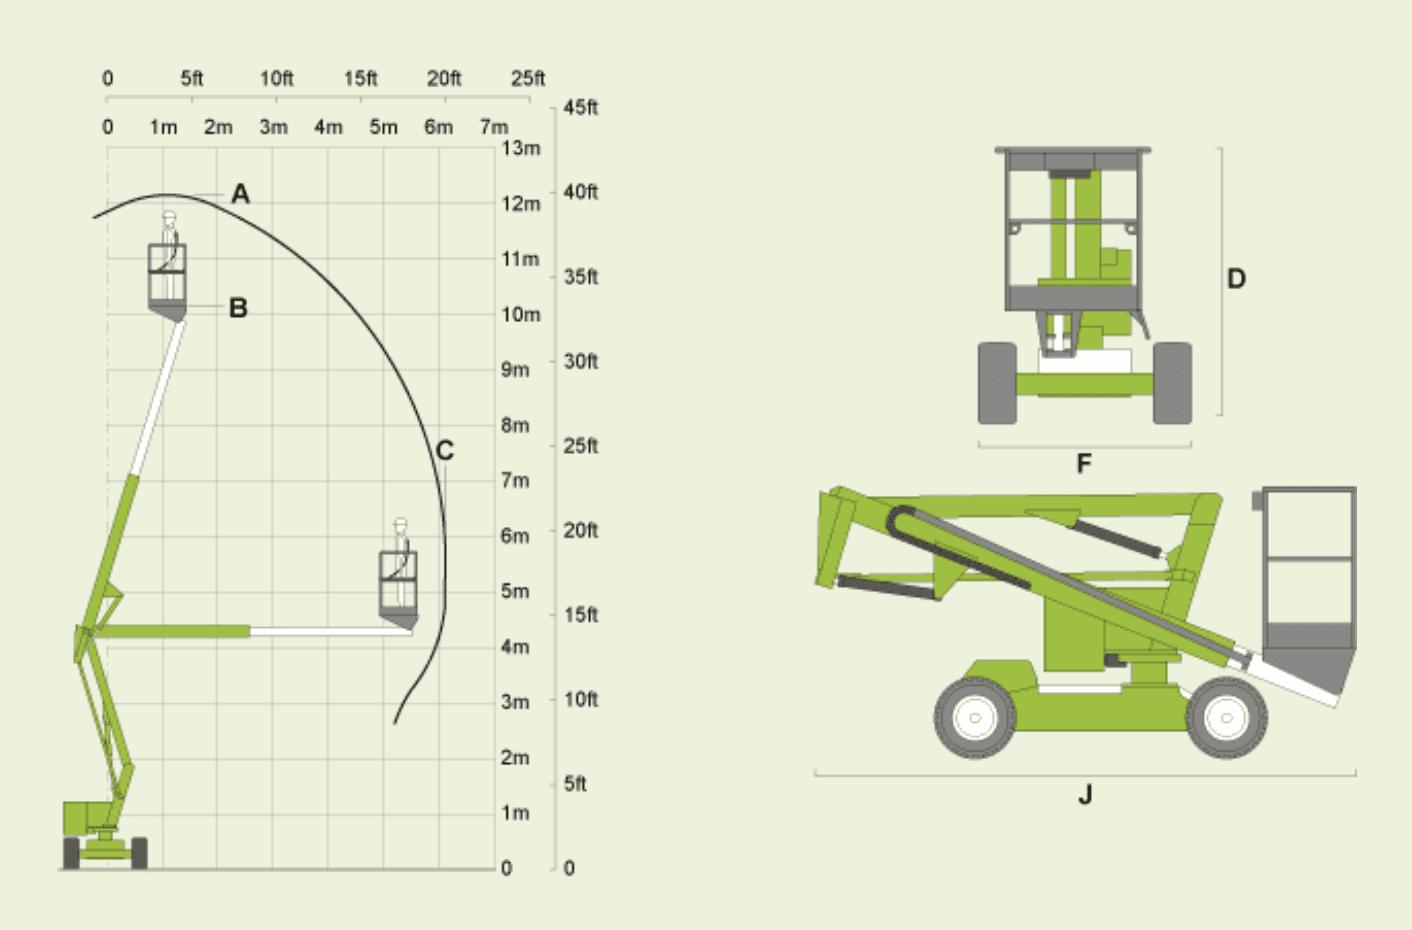 HR12 Narrow diagram